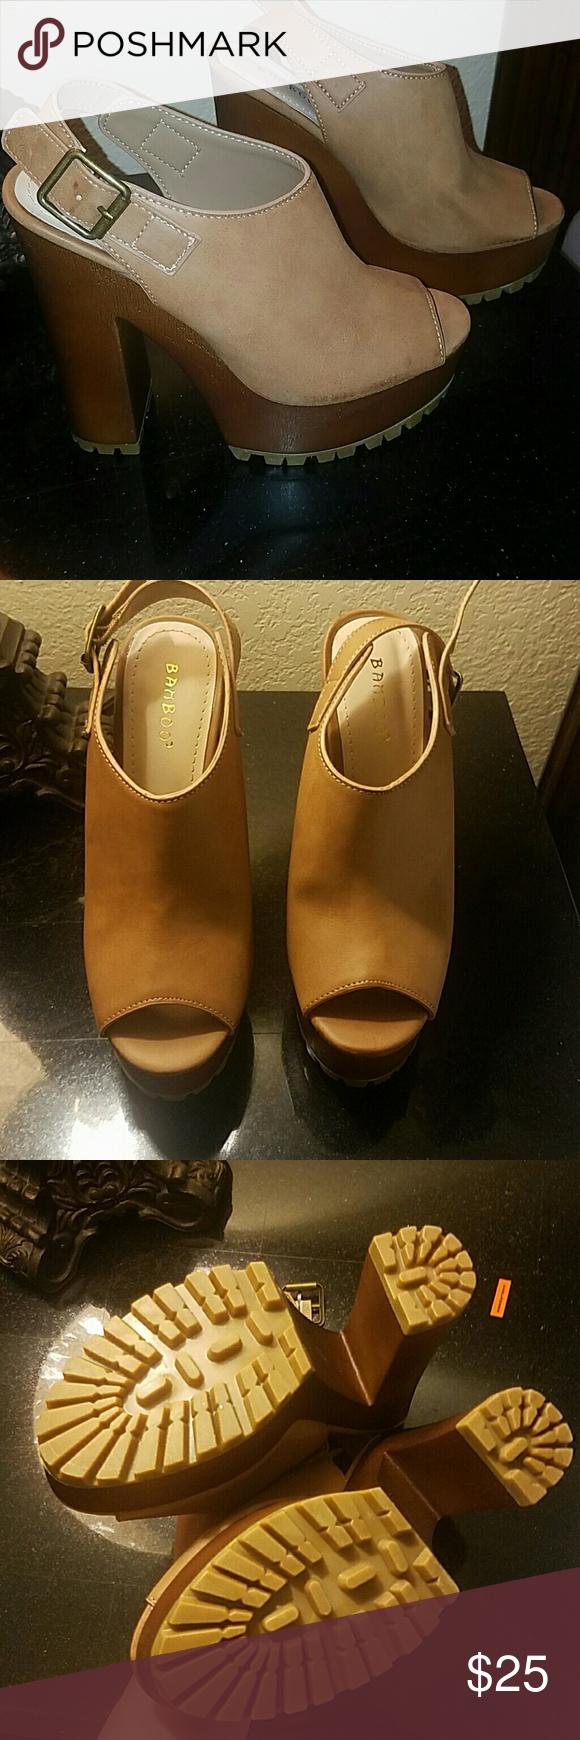 NEW Platform  tan & brown heels mule shoe Never worn Shoes Mules & Clogs